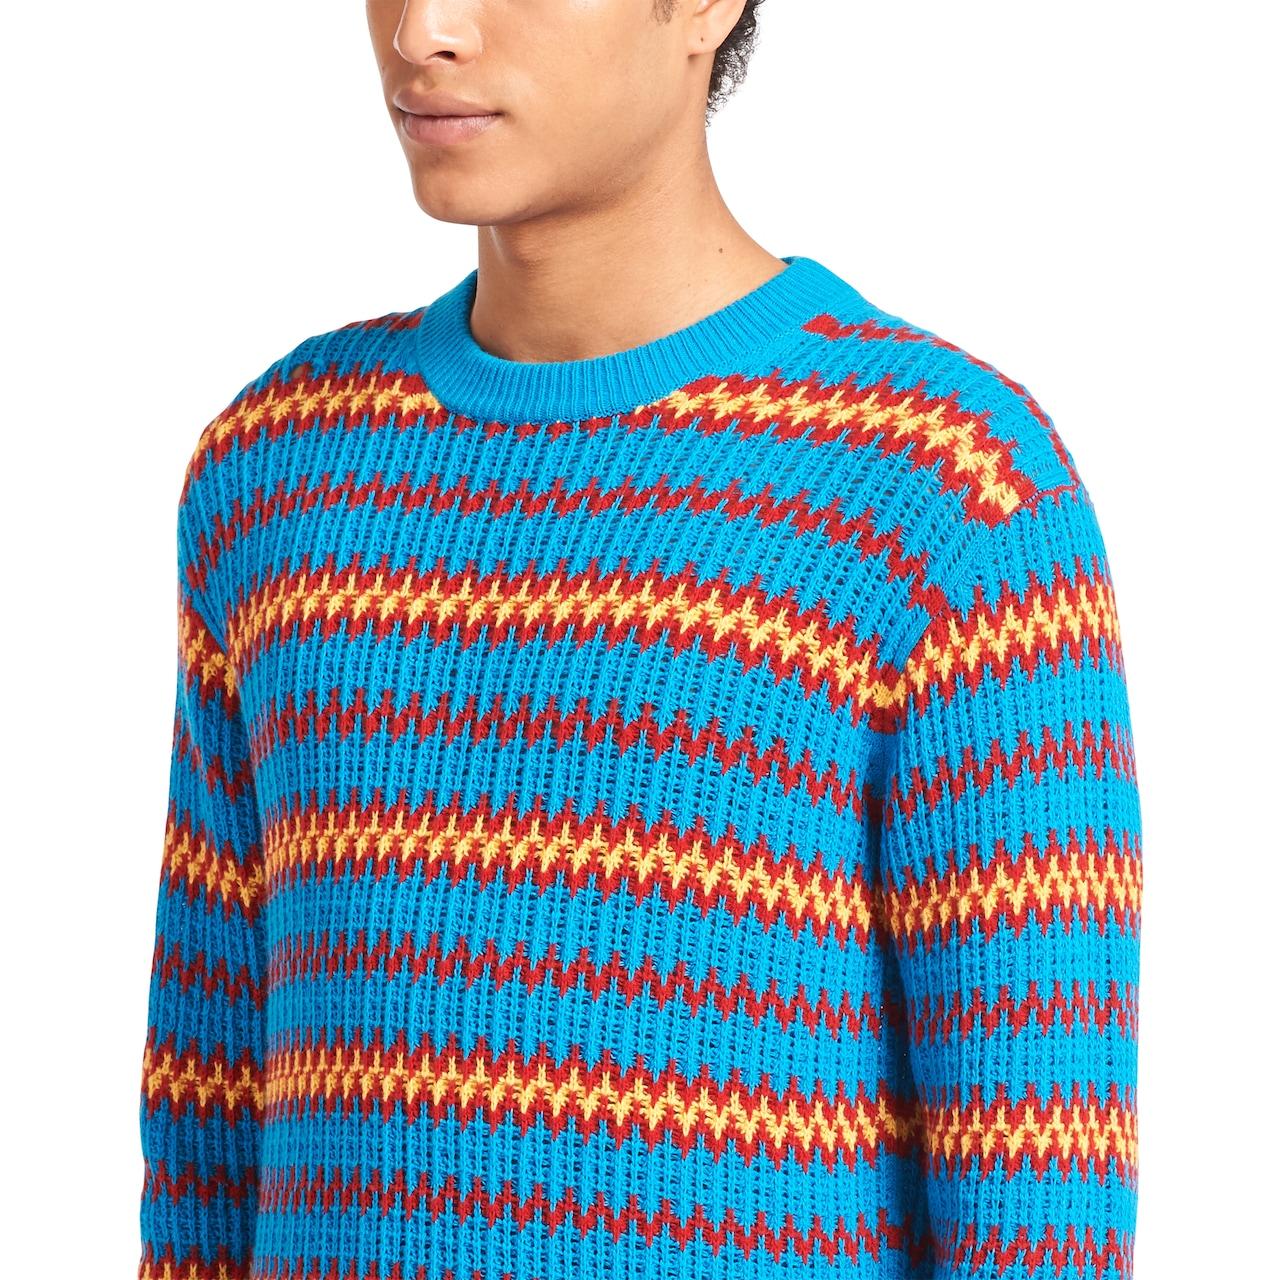 Prada Wool and cashmere sweater 5